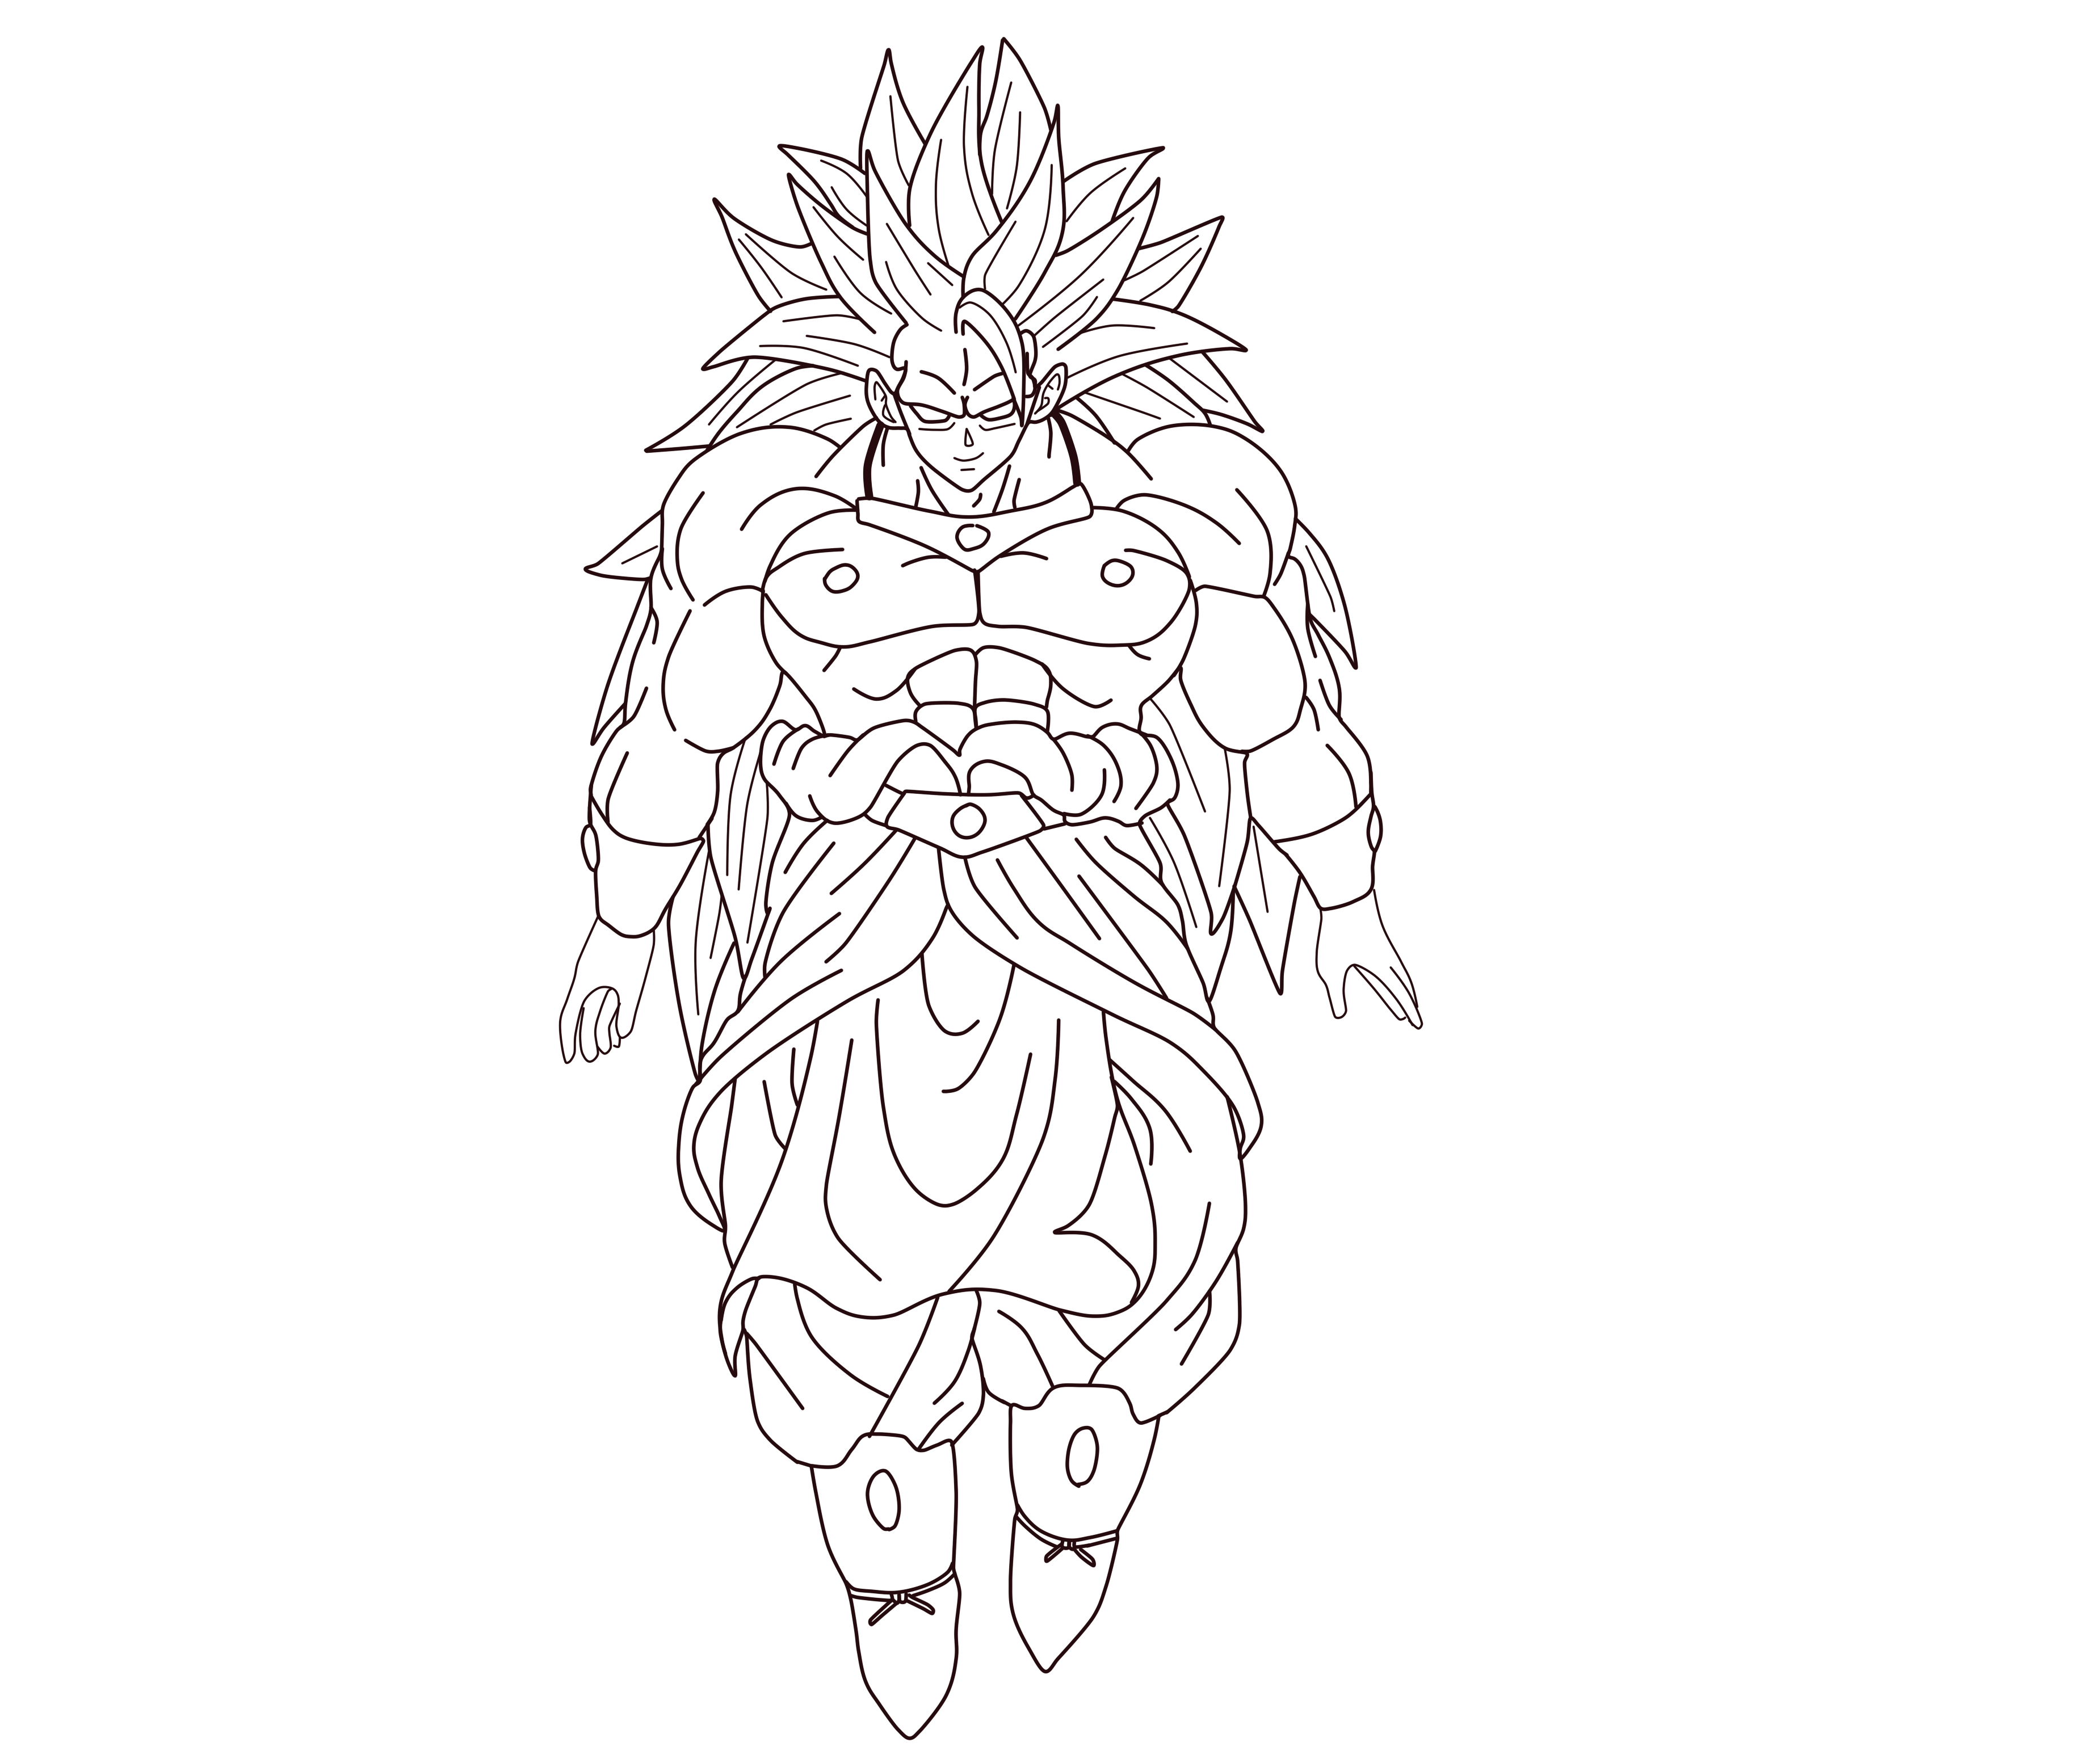 Broly LSSJ3  What If Saga by ZedCreations on DeviantArt